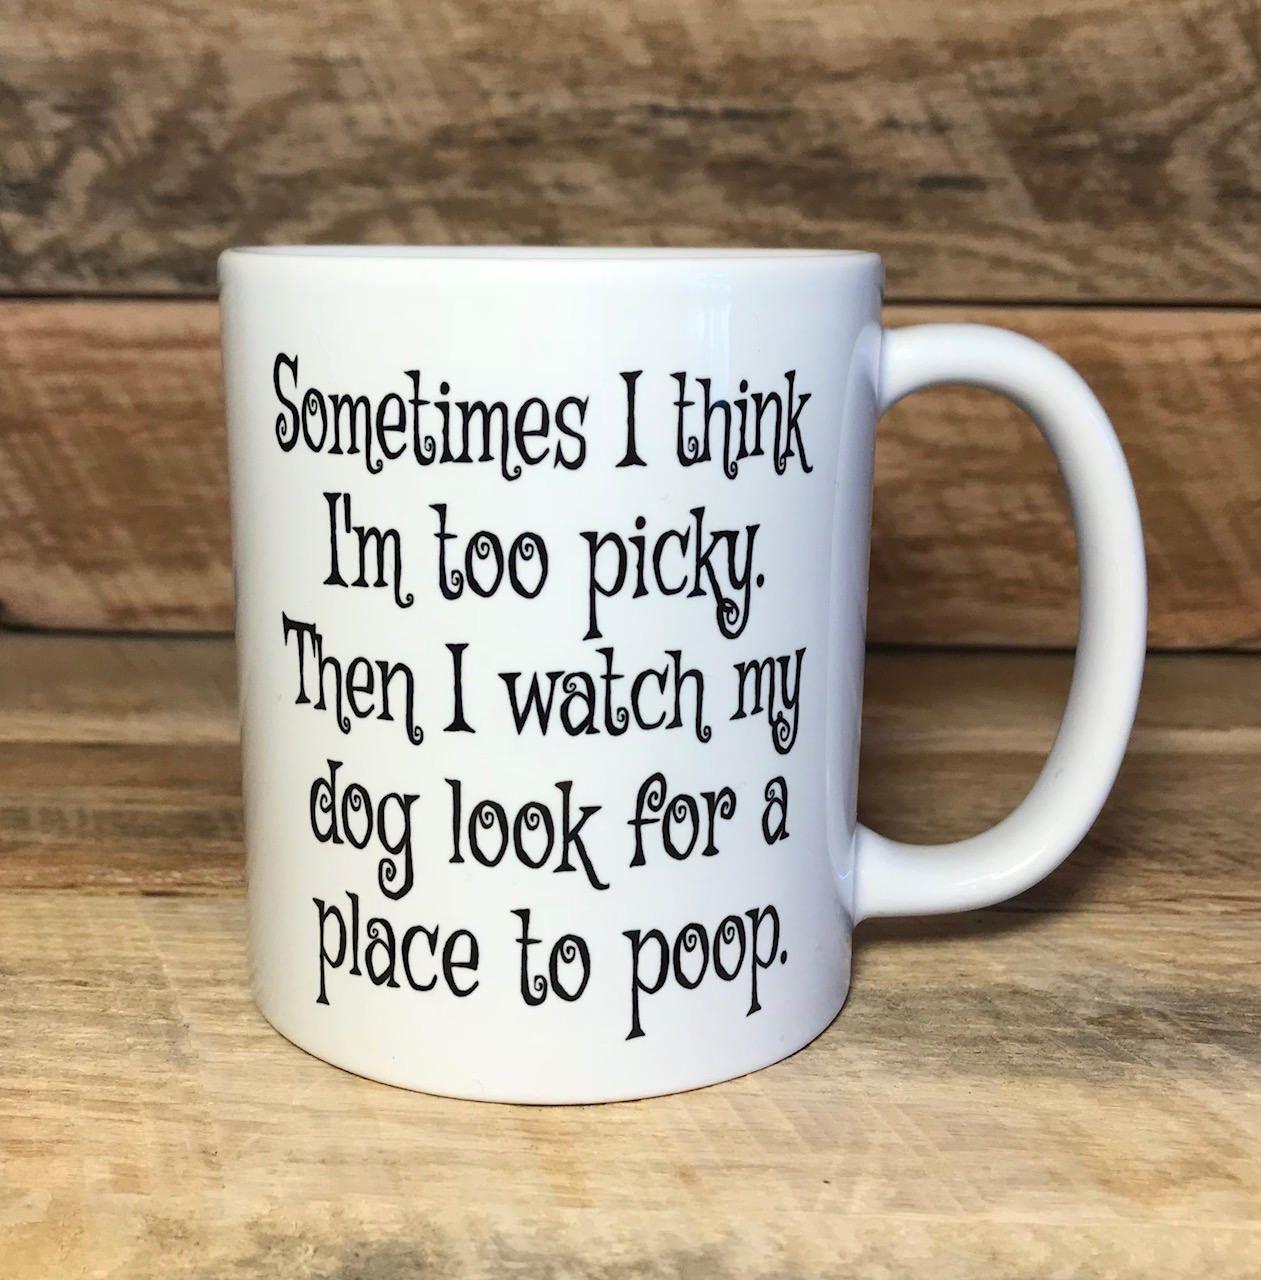 Funny Coffee Mug Funny Dog Mug Coffee Mug Mug Mug With Sayings Coffee Mug With Sayings Gift Ideas Home An Funny Coffee Cups Funny Coffee Mugs Coffee Humor